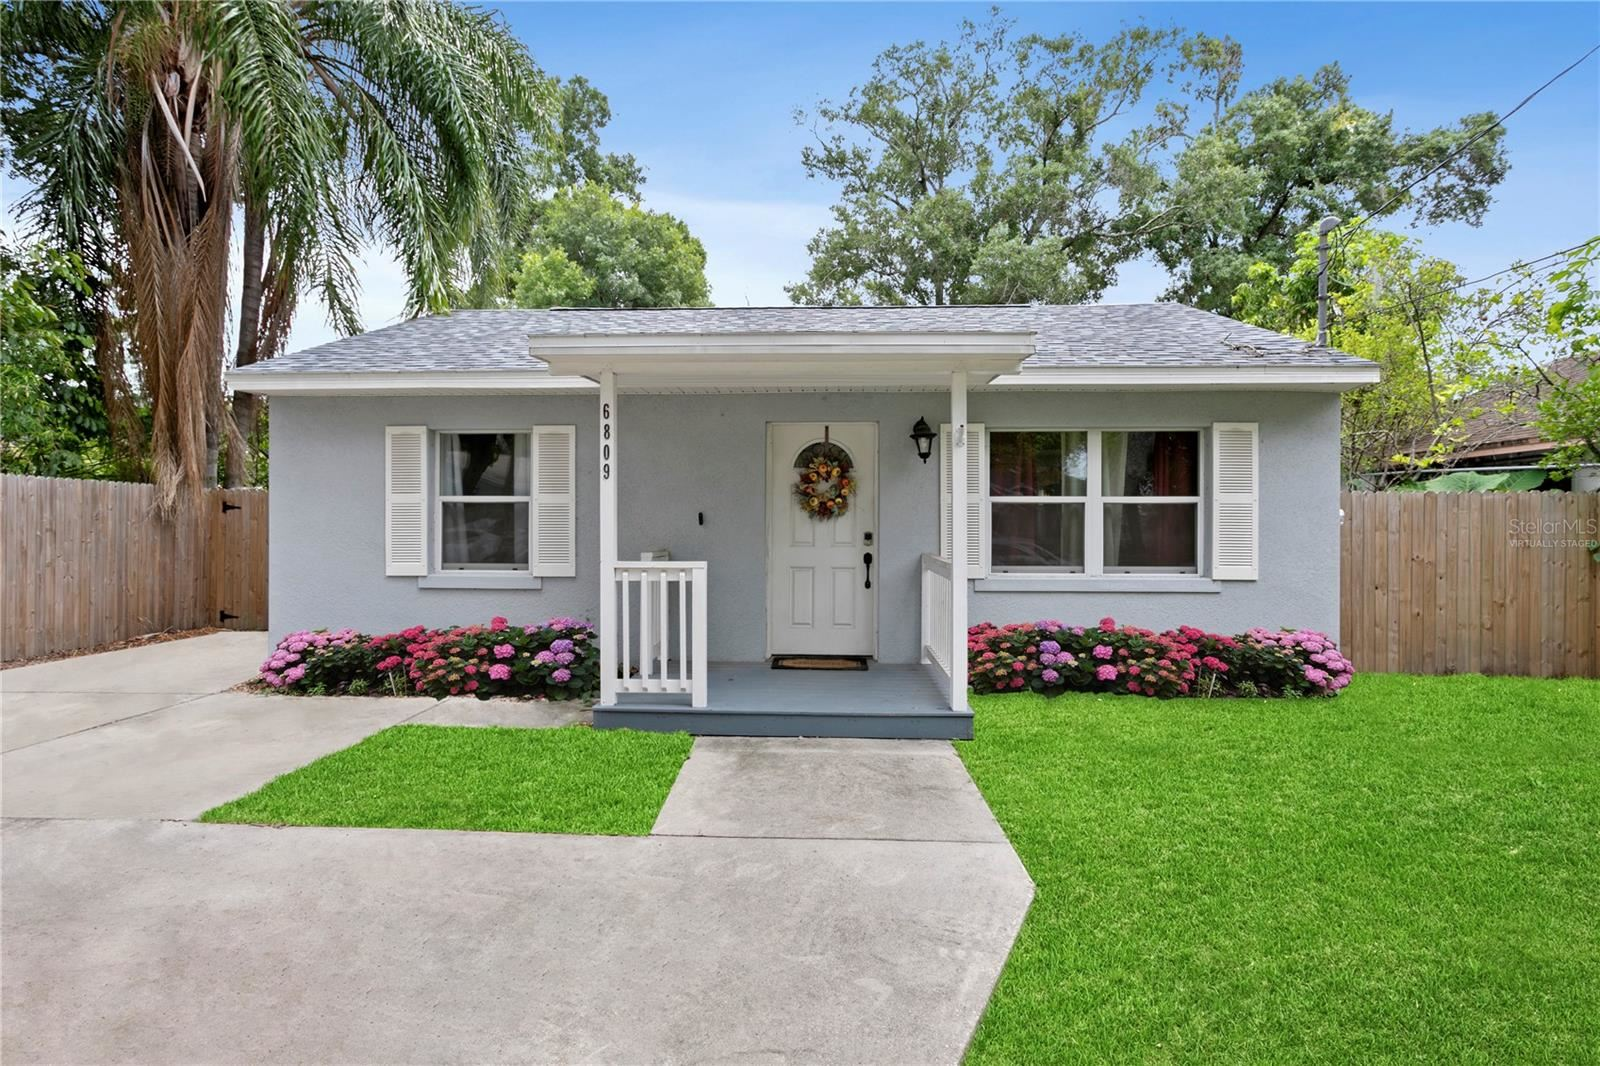 6809 N STERLING AVENUE, Tampa, FL 33614 - #: T3313156